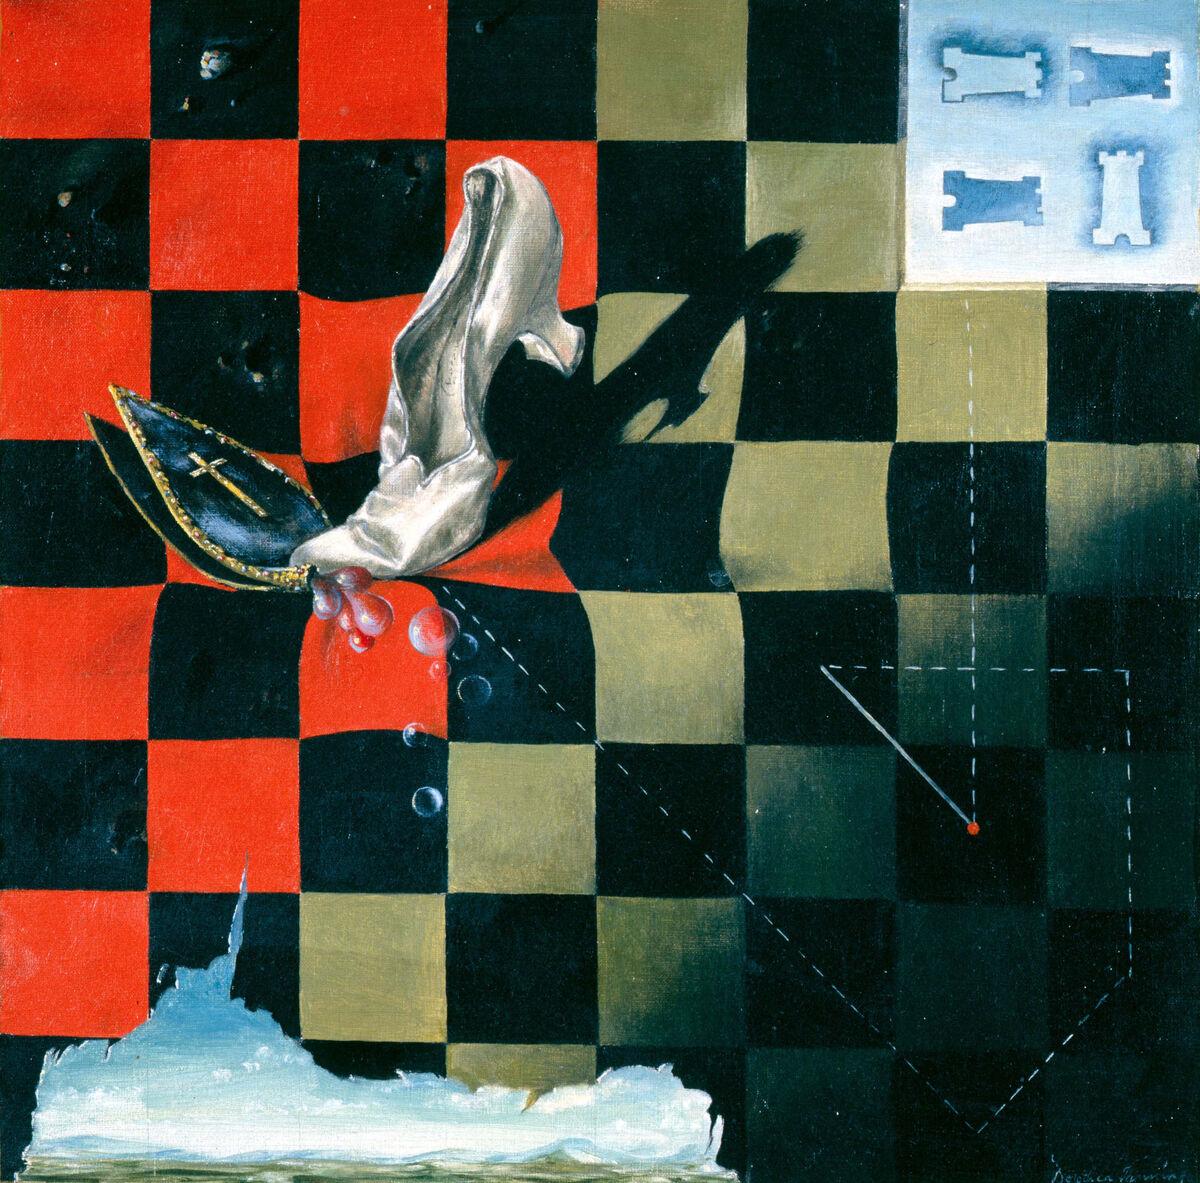 Dorothea Tanning, Endgame, 1944. © DACS, 2018. Courtesy of Tate Modern.